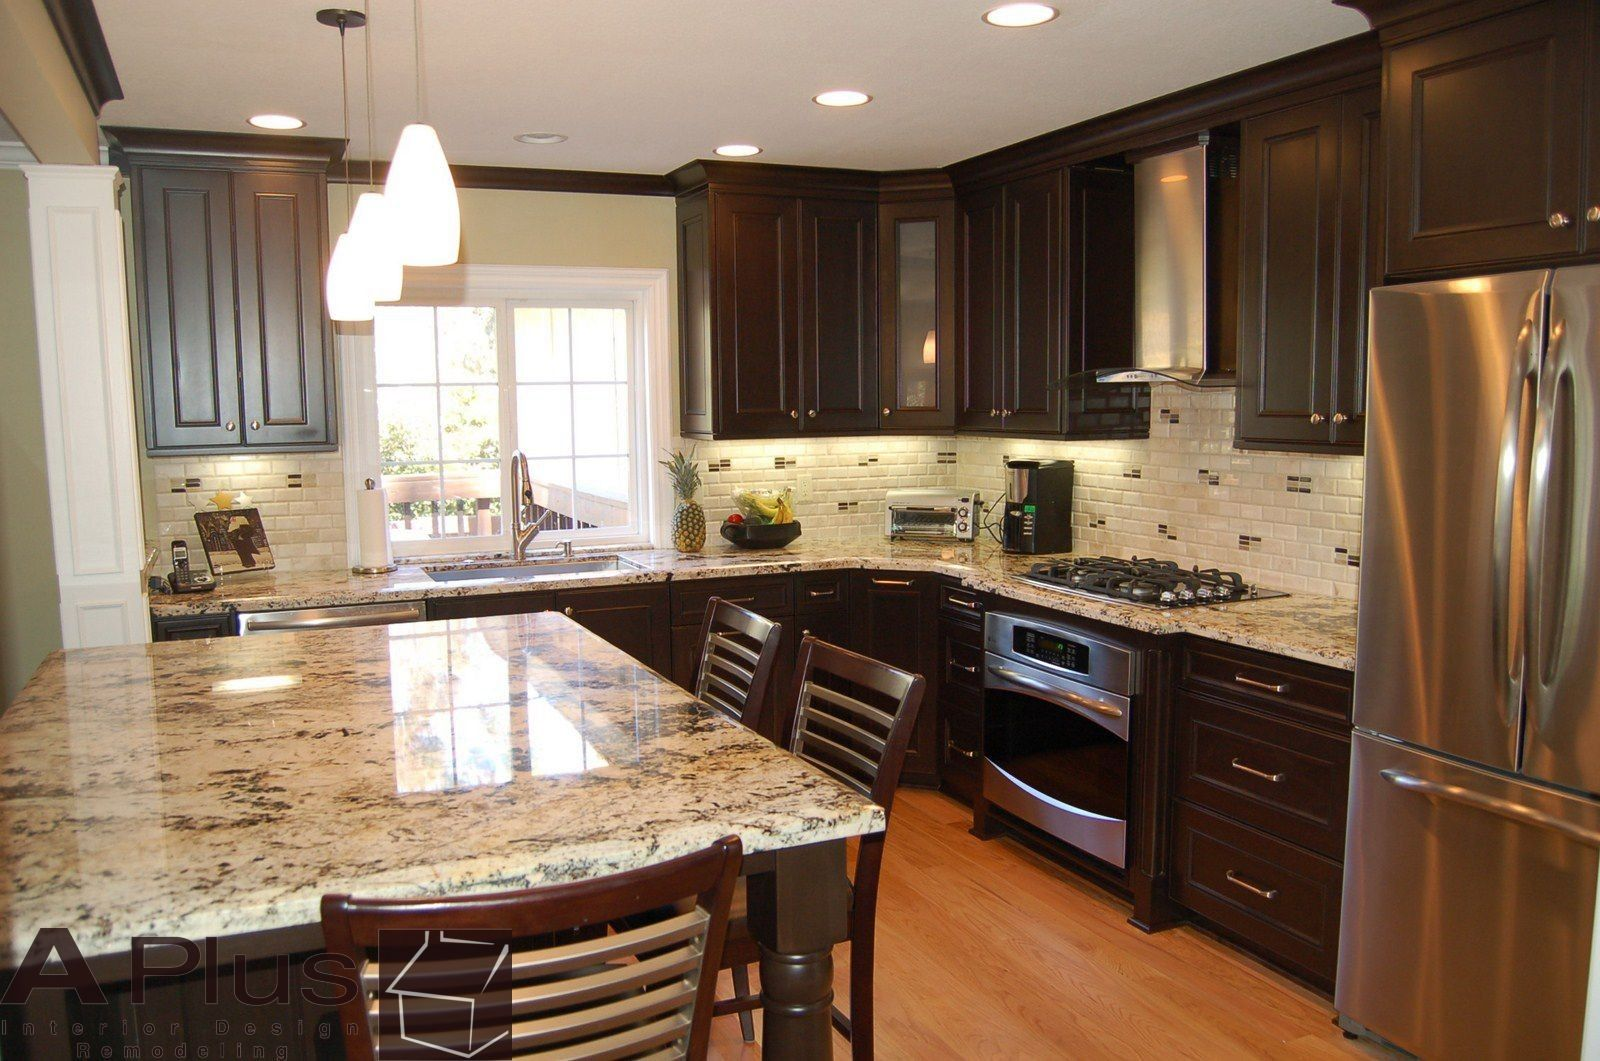 My Favorite Look Dark Cabinets Light Granite Beautiful Kitchen Cabinets Kitchen Color Dark Cabinets Kitchen Cabinet Remodel